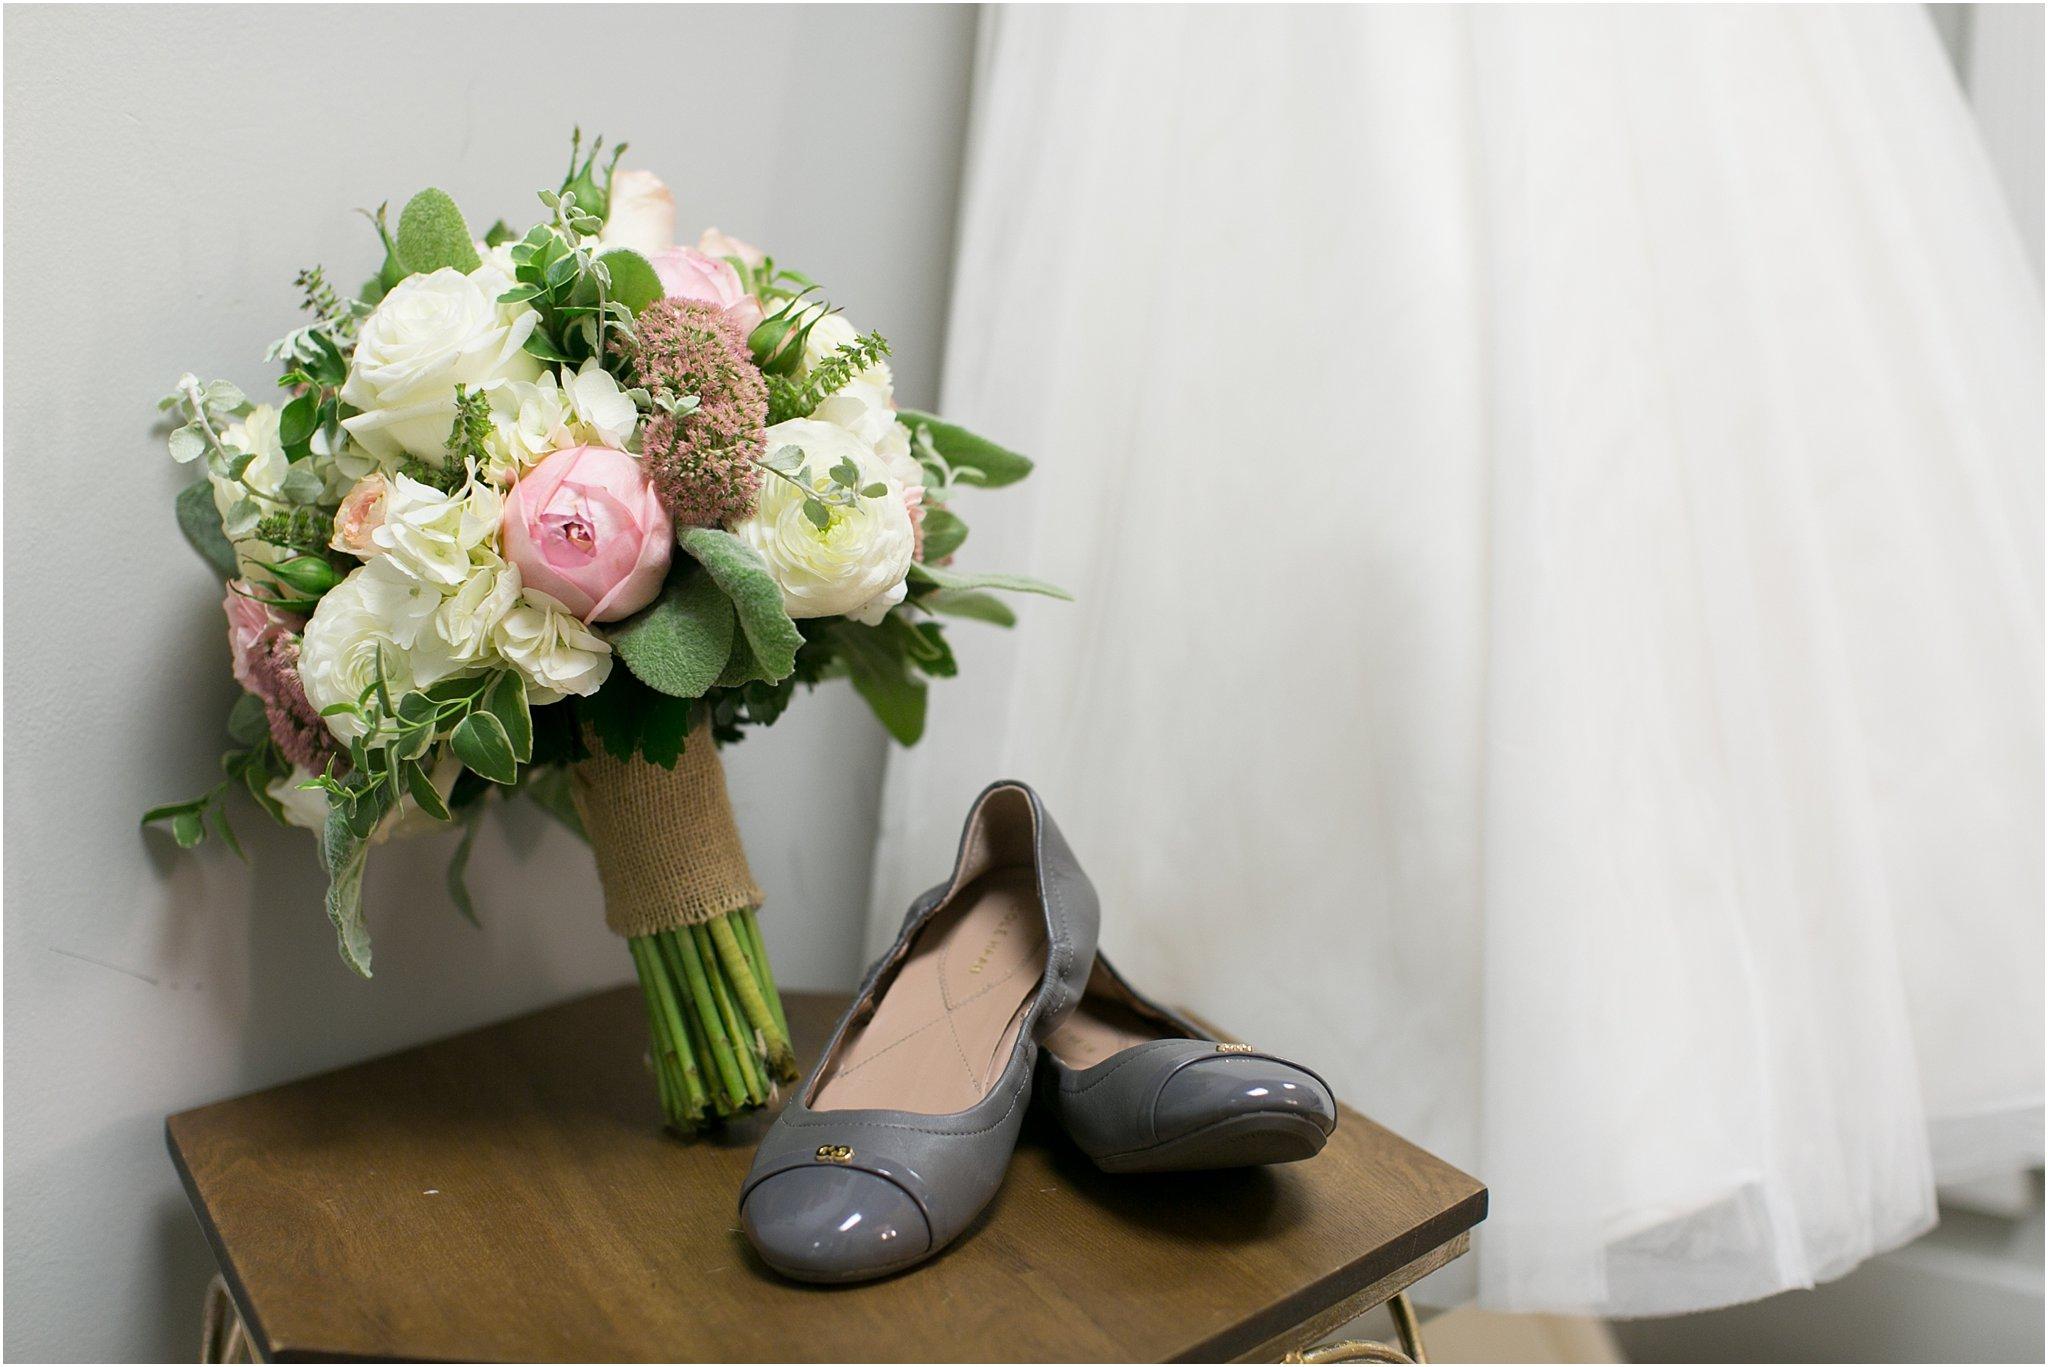 jessica_ryan_photography_virginia_wedding_photographer_wedding_hurricane_norfolk_botanical_gardens_hurricane_matthew_wedding_3544